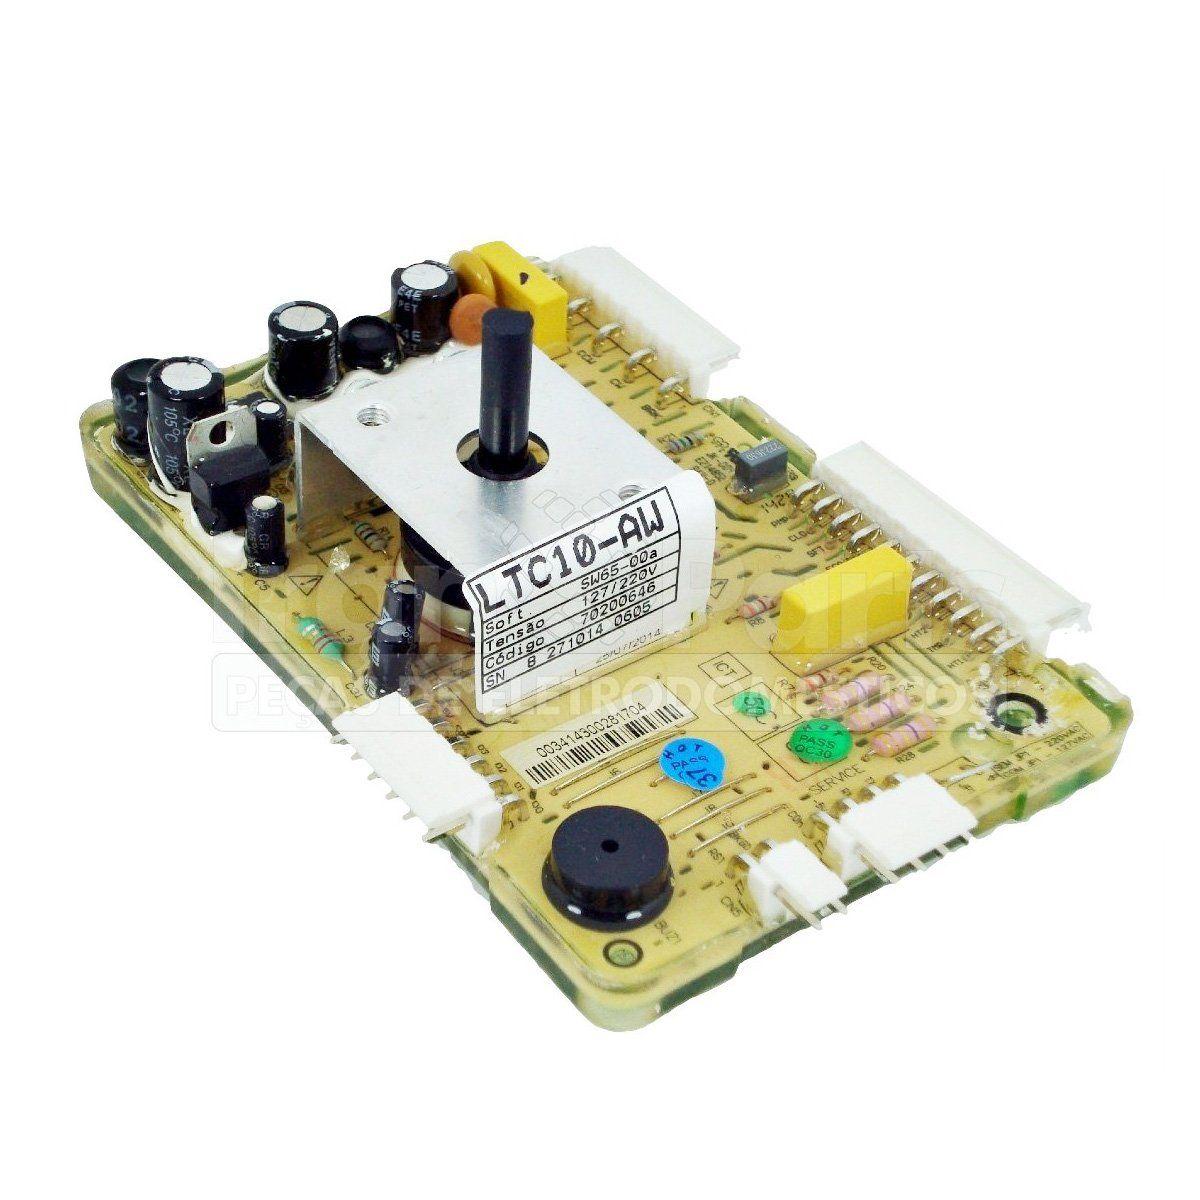 Placa De Potência Lavadora Electrolux Ltc10 - 70200646